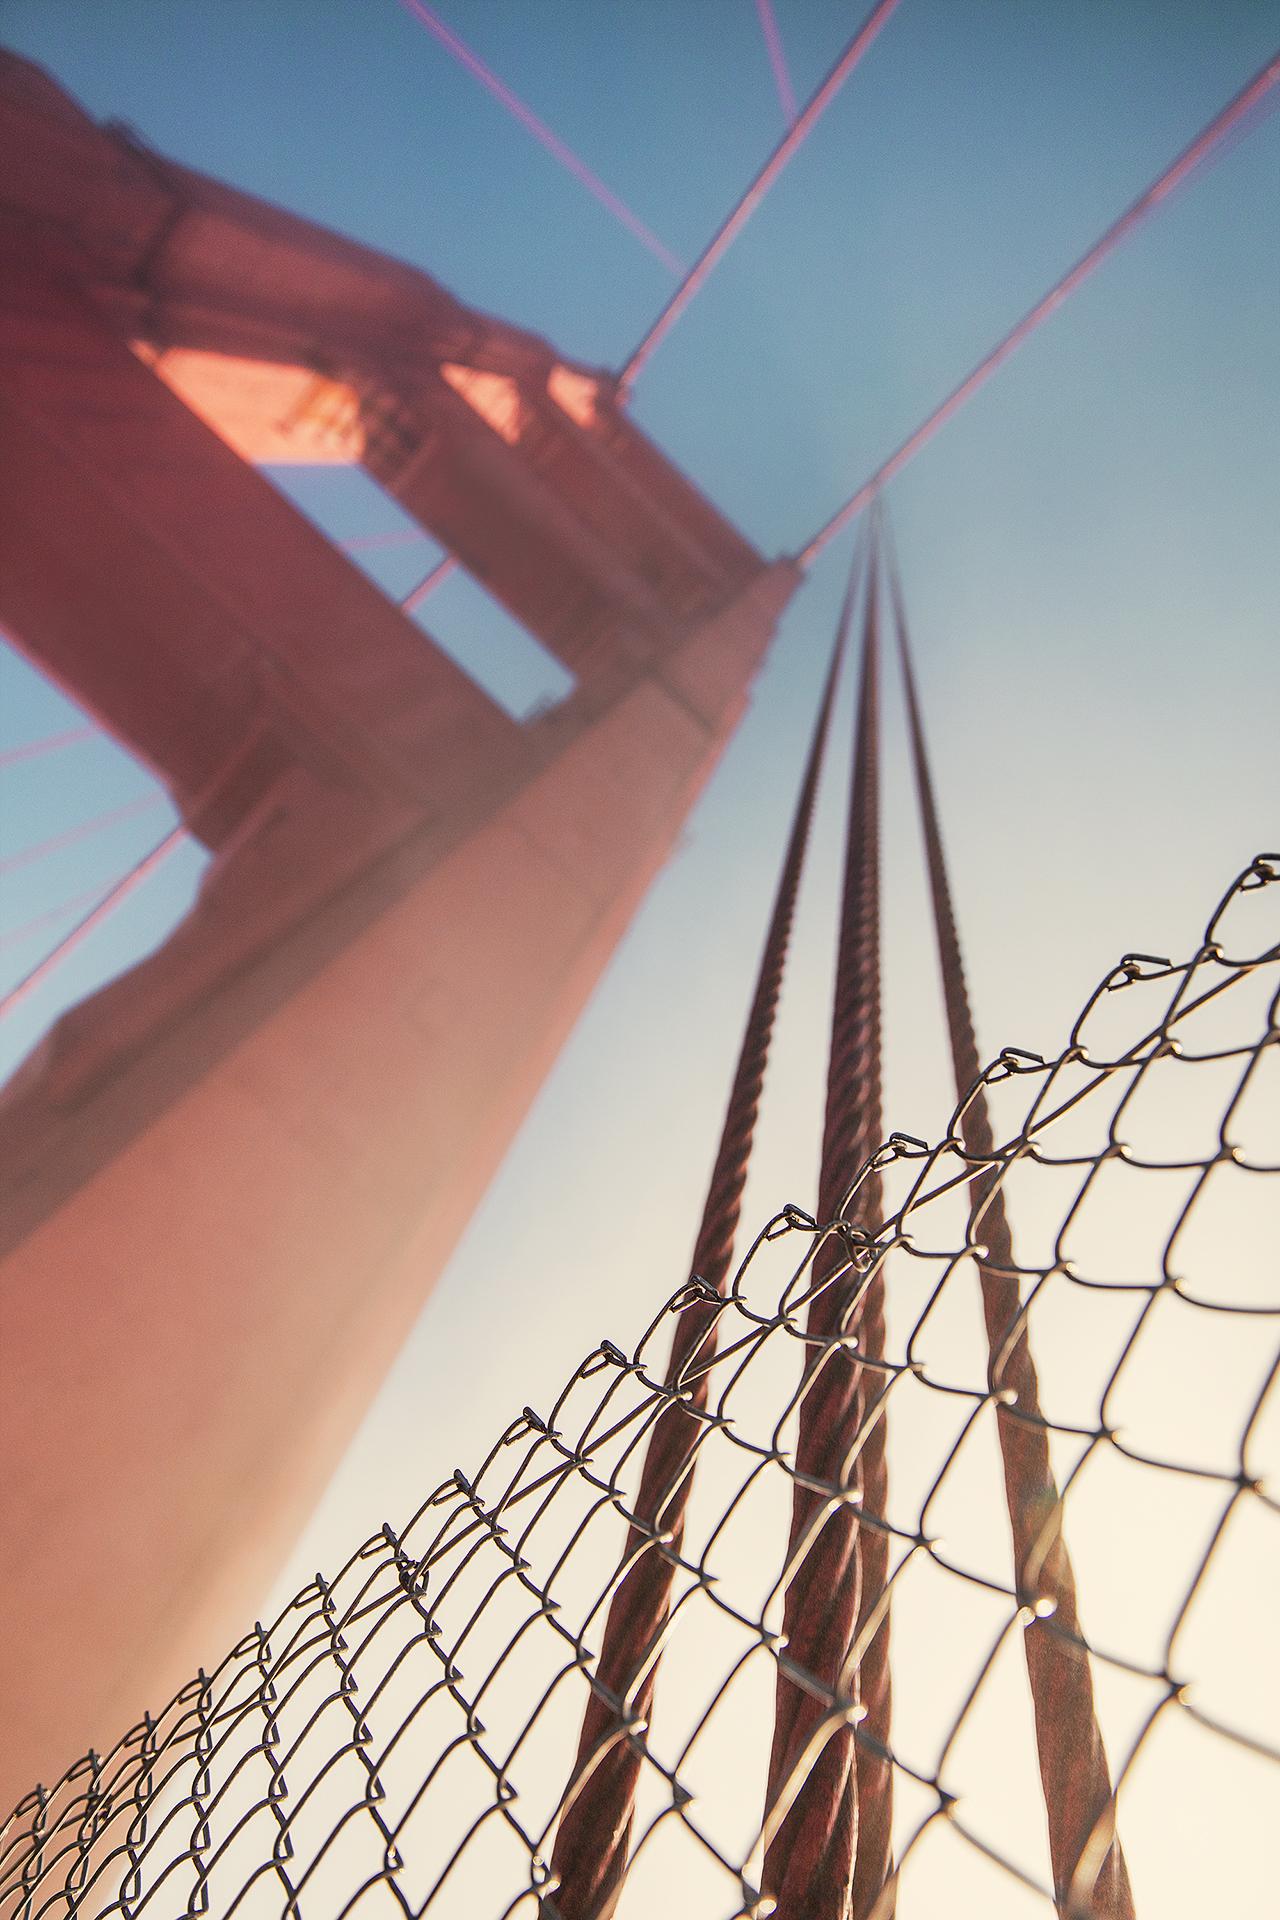 More Than Just Photos 637 - Golden Gate Bridge